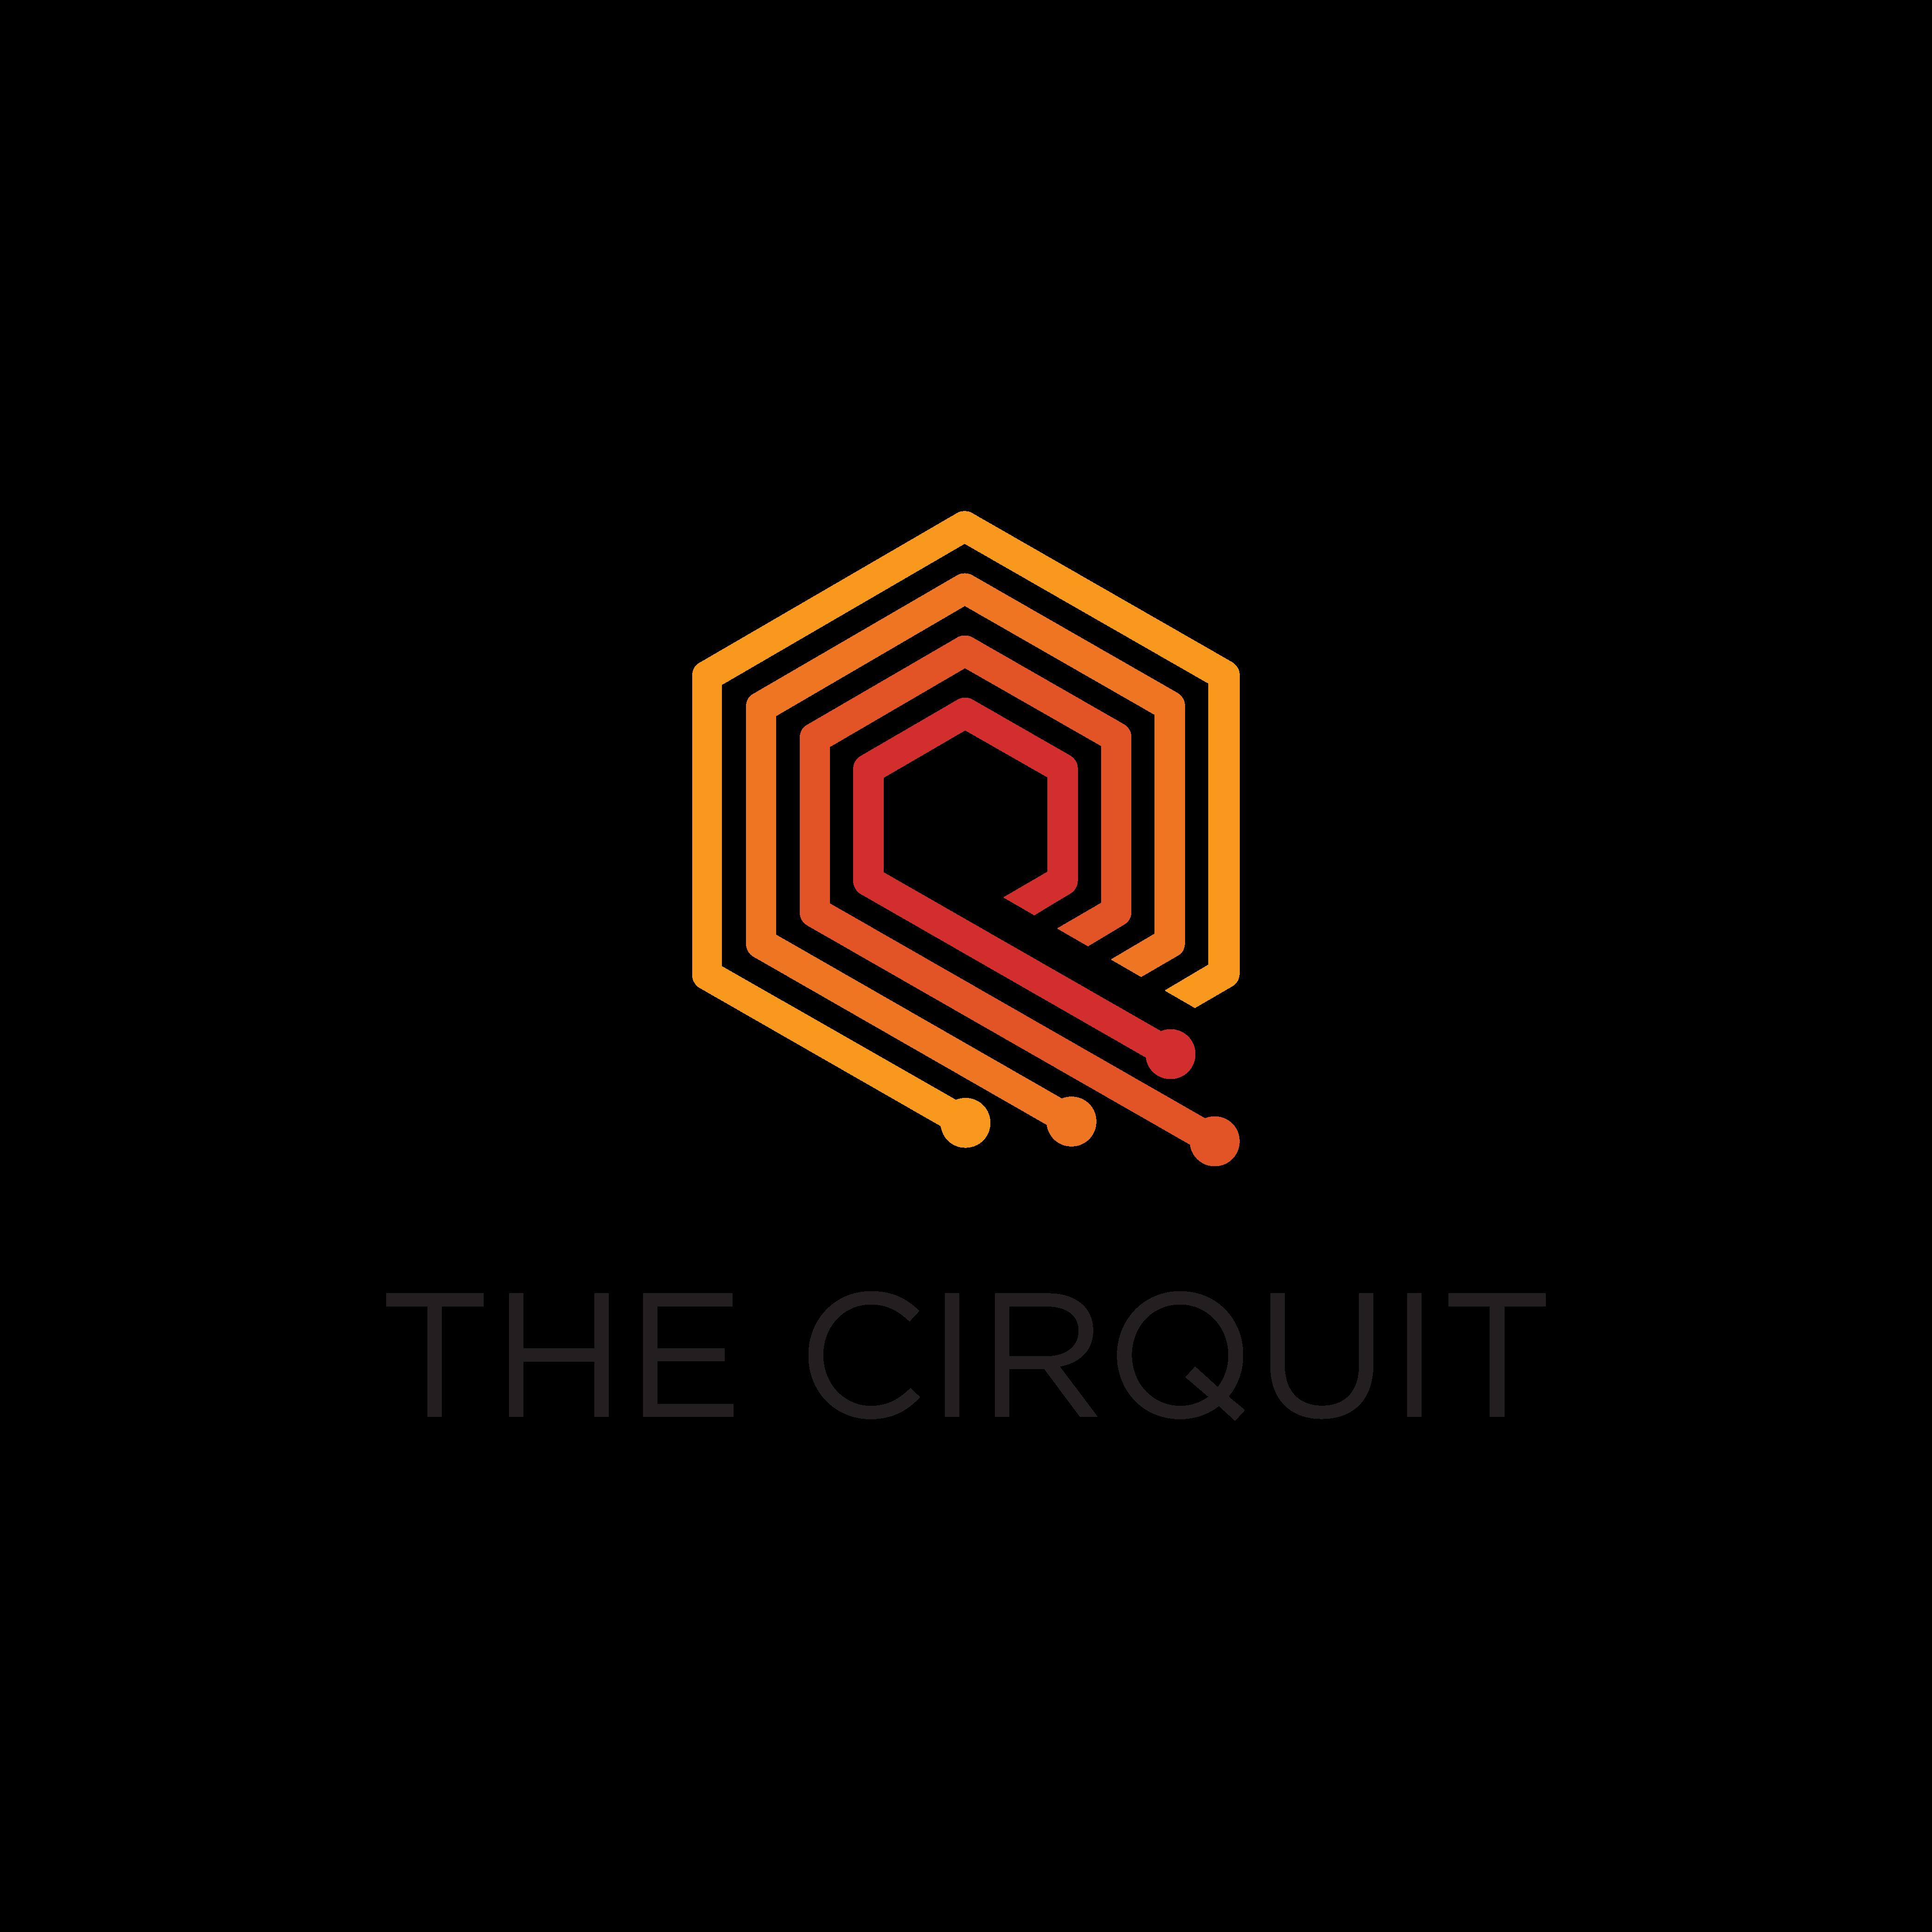 The Cirquit logo